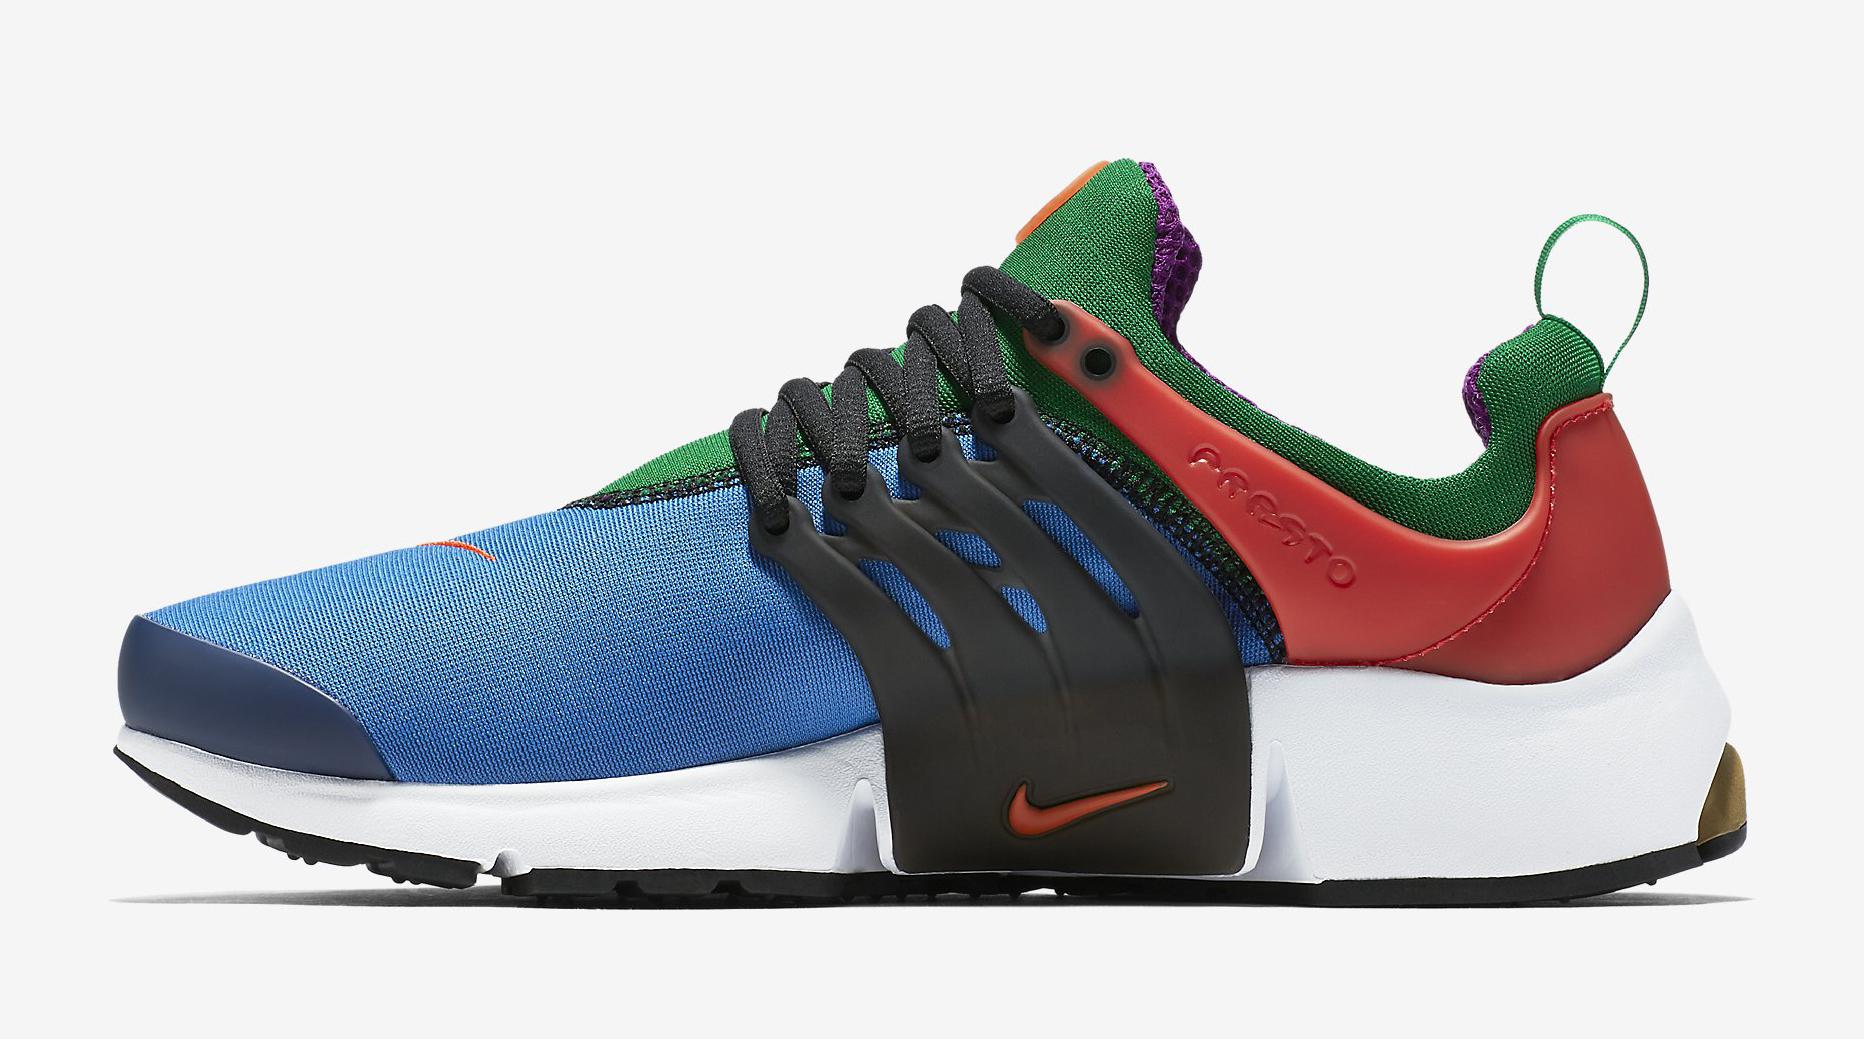 Greedy Nike Air Presto 886043-400 Medial